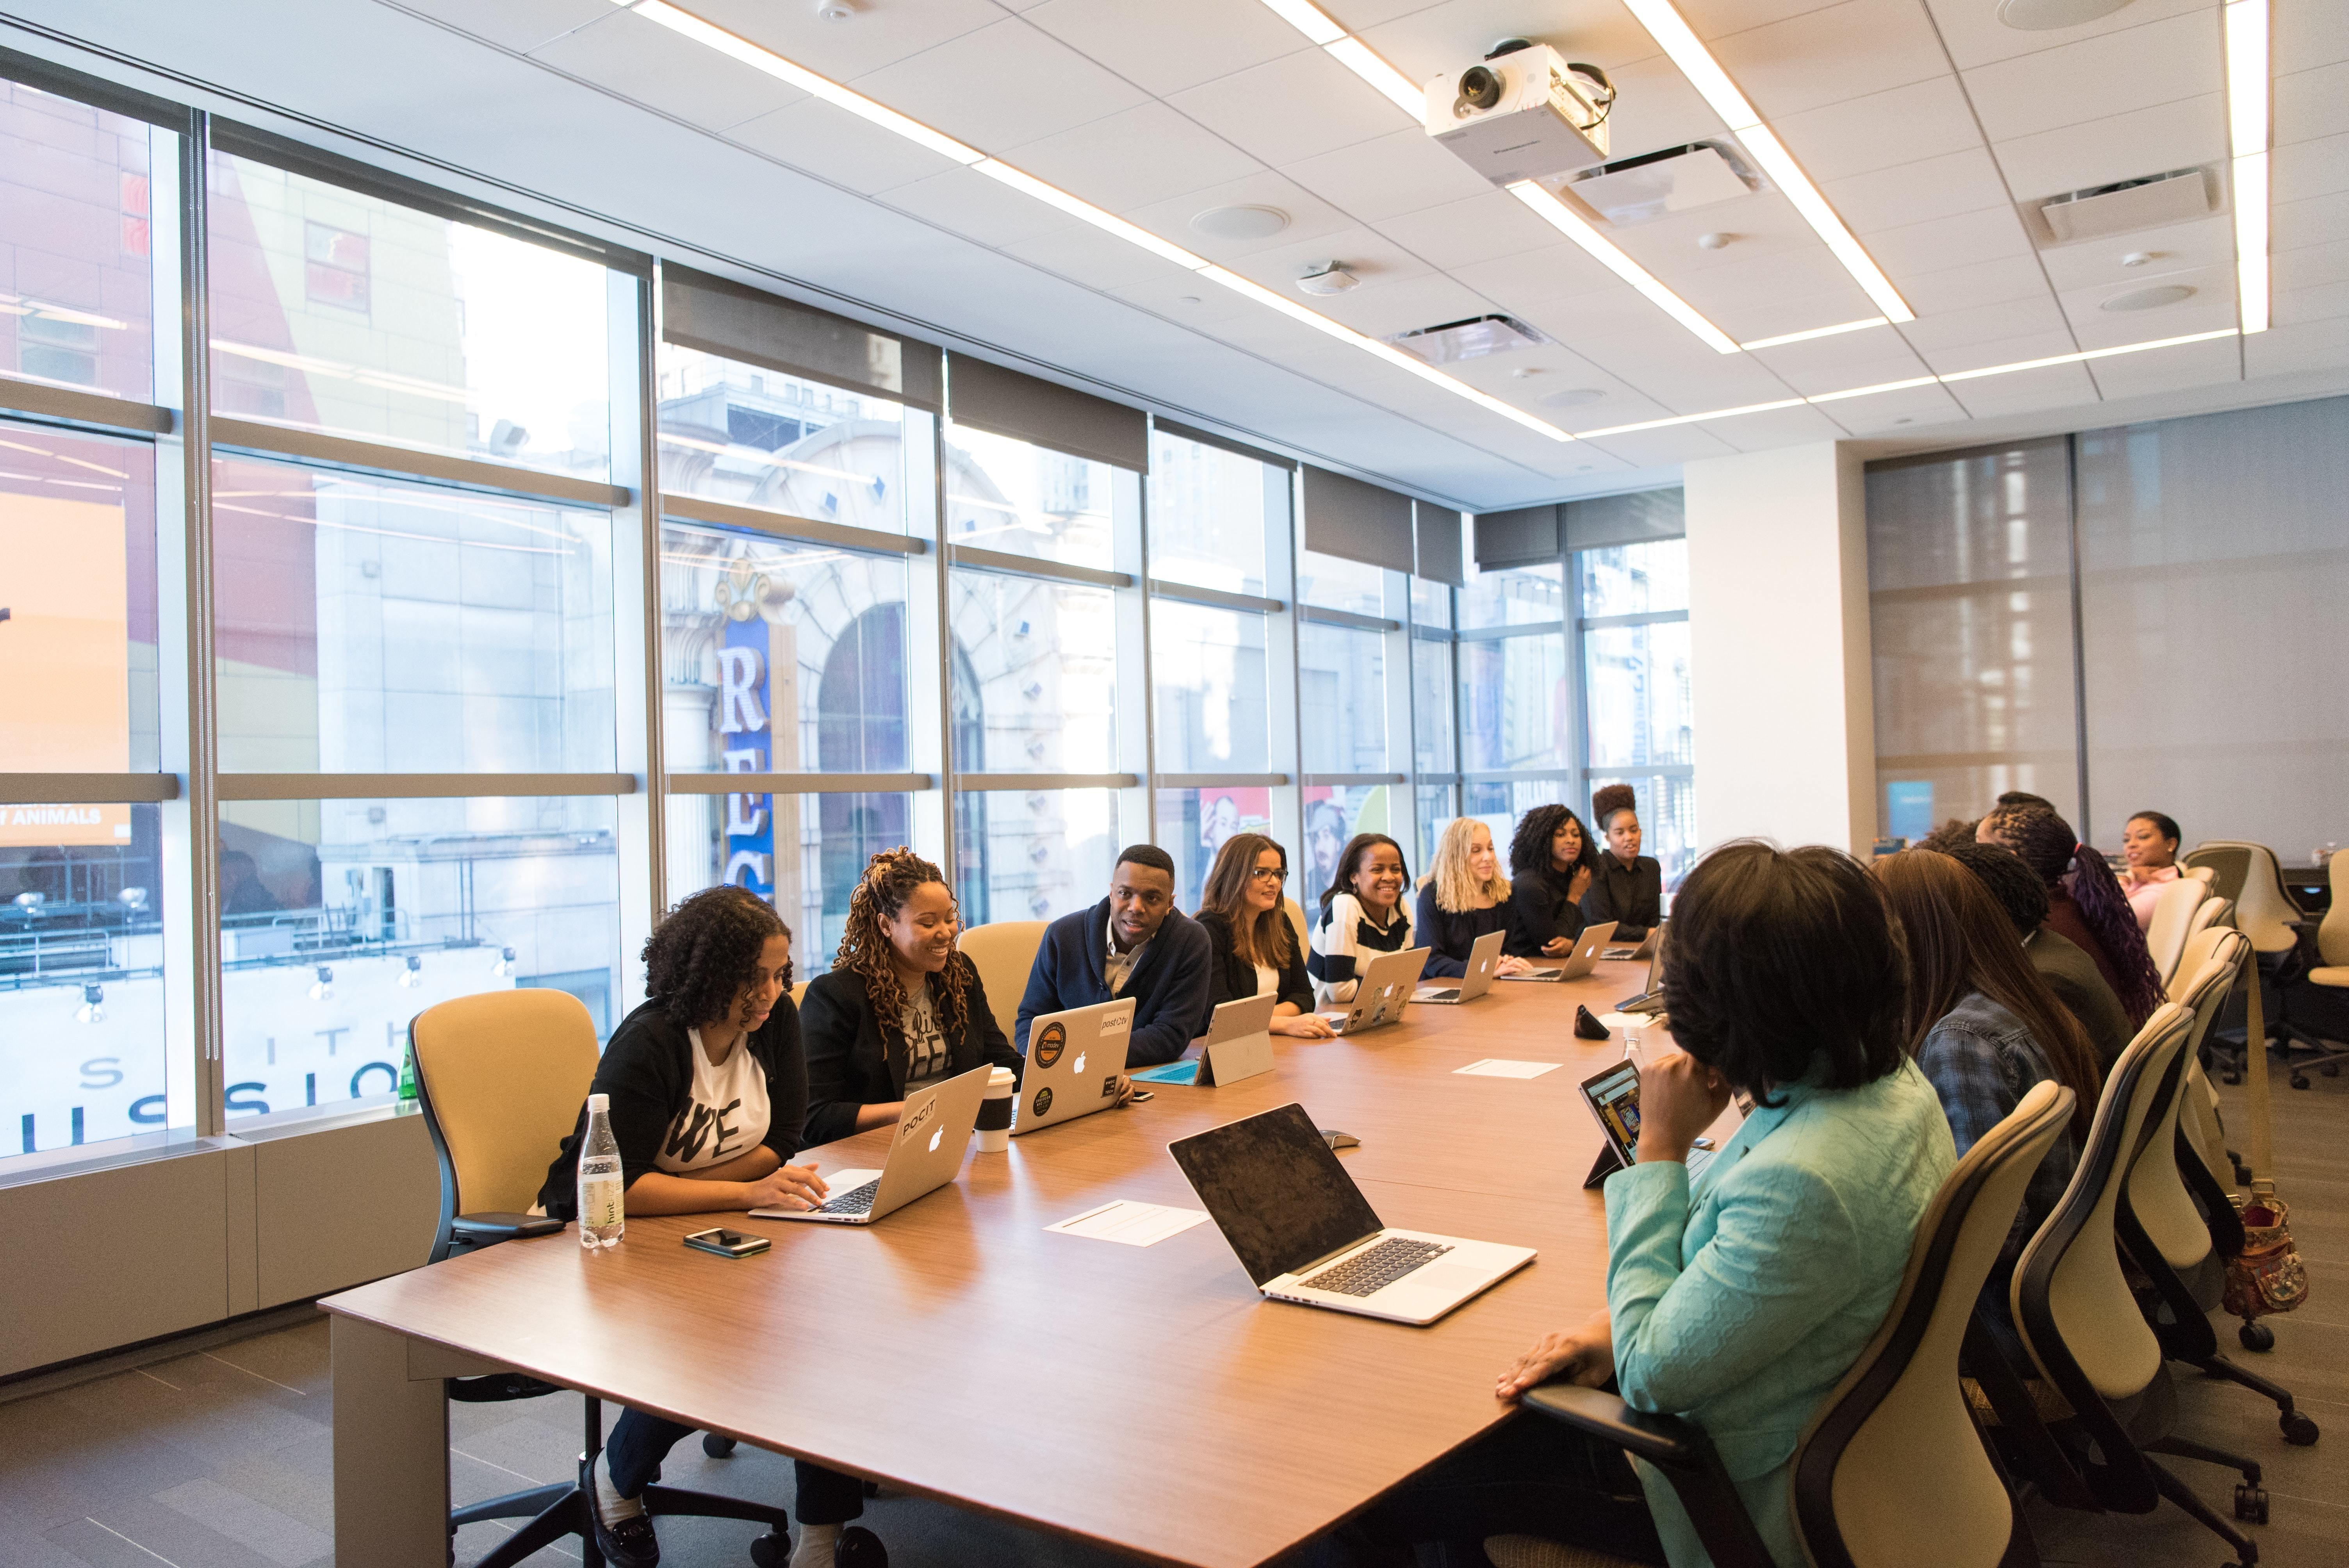 race racism systemic work workplace culture racial bias prejudice